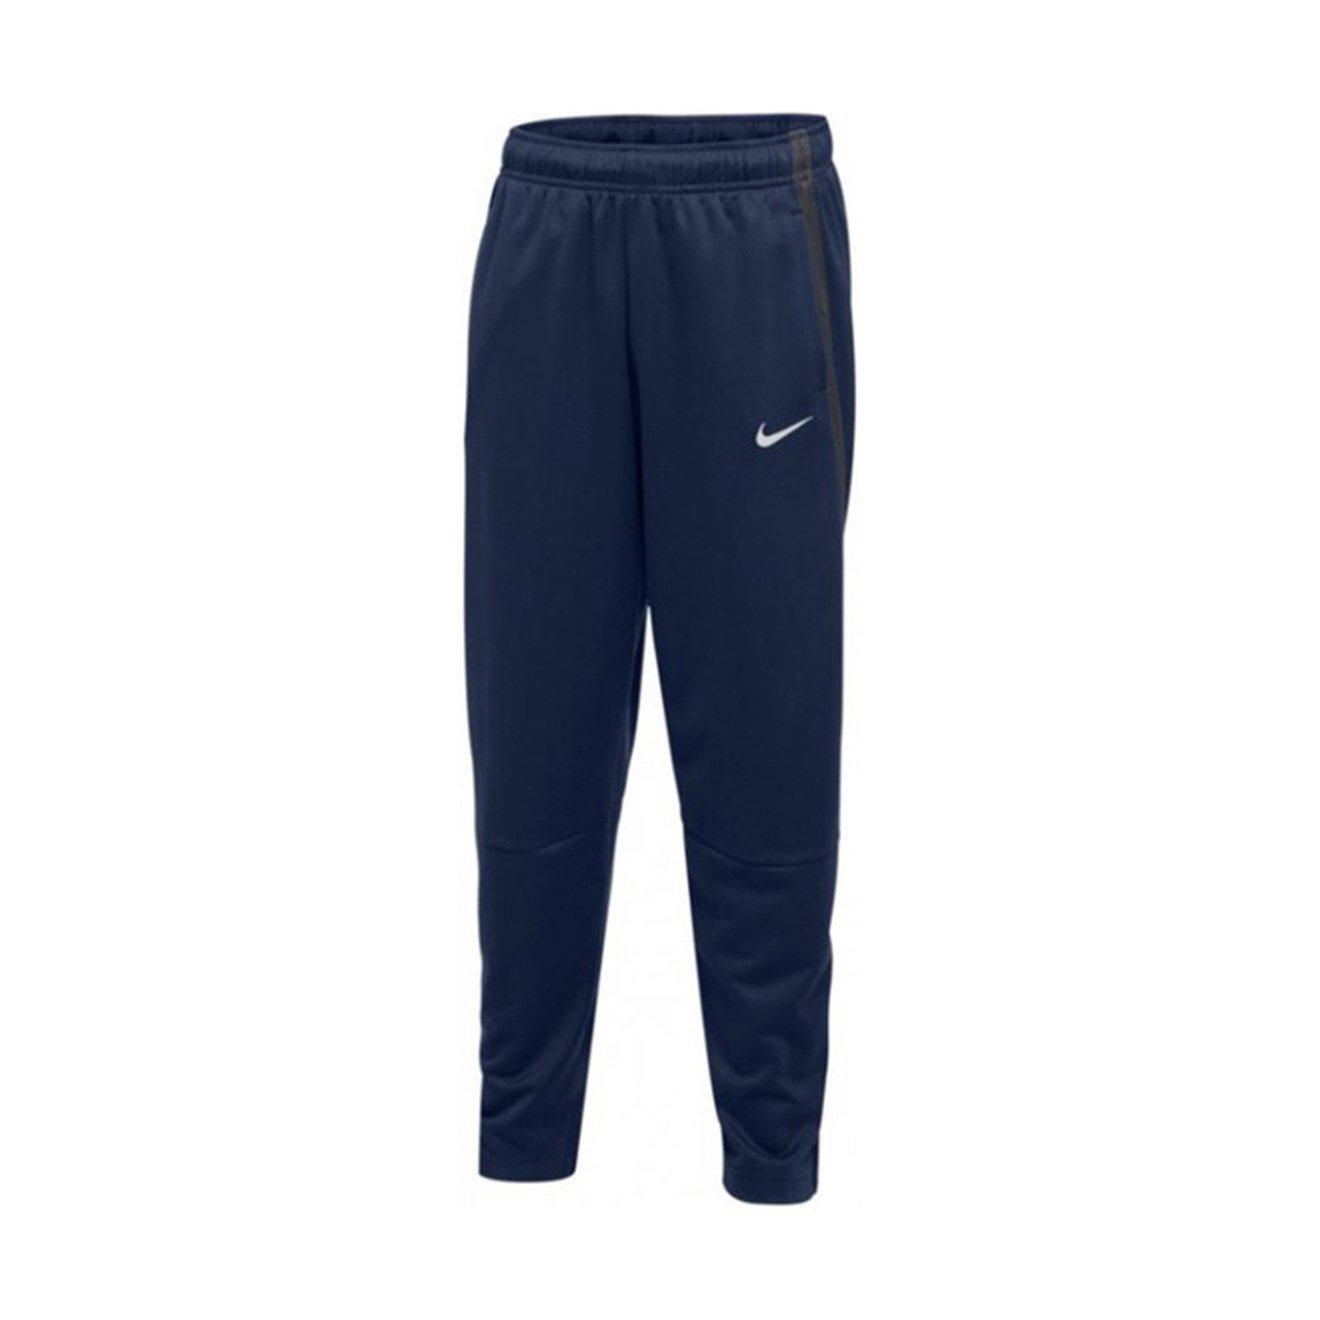 5d2ca551b87d Amazon.com  Nike Epic Training Pant Youth  Sports   Outdoors